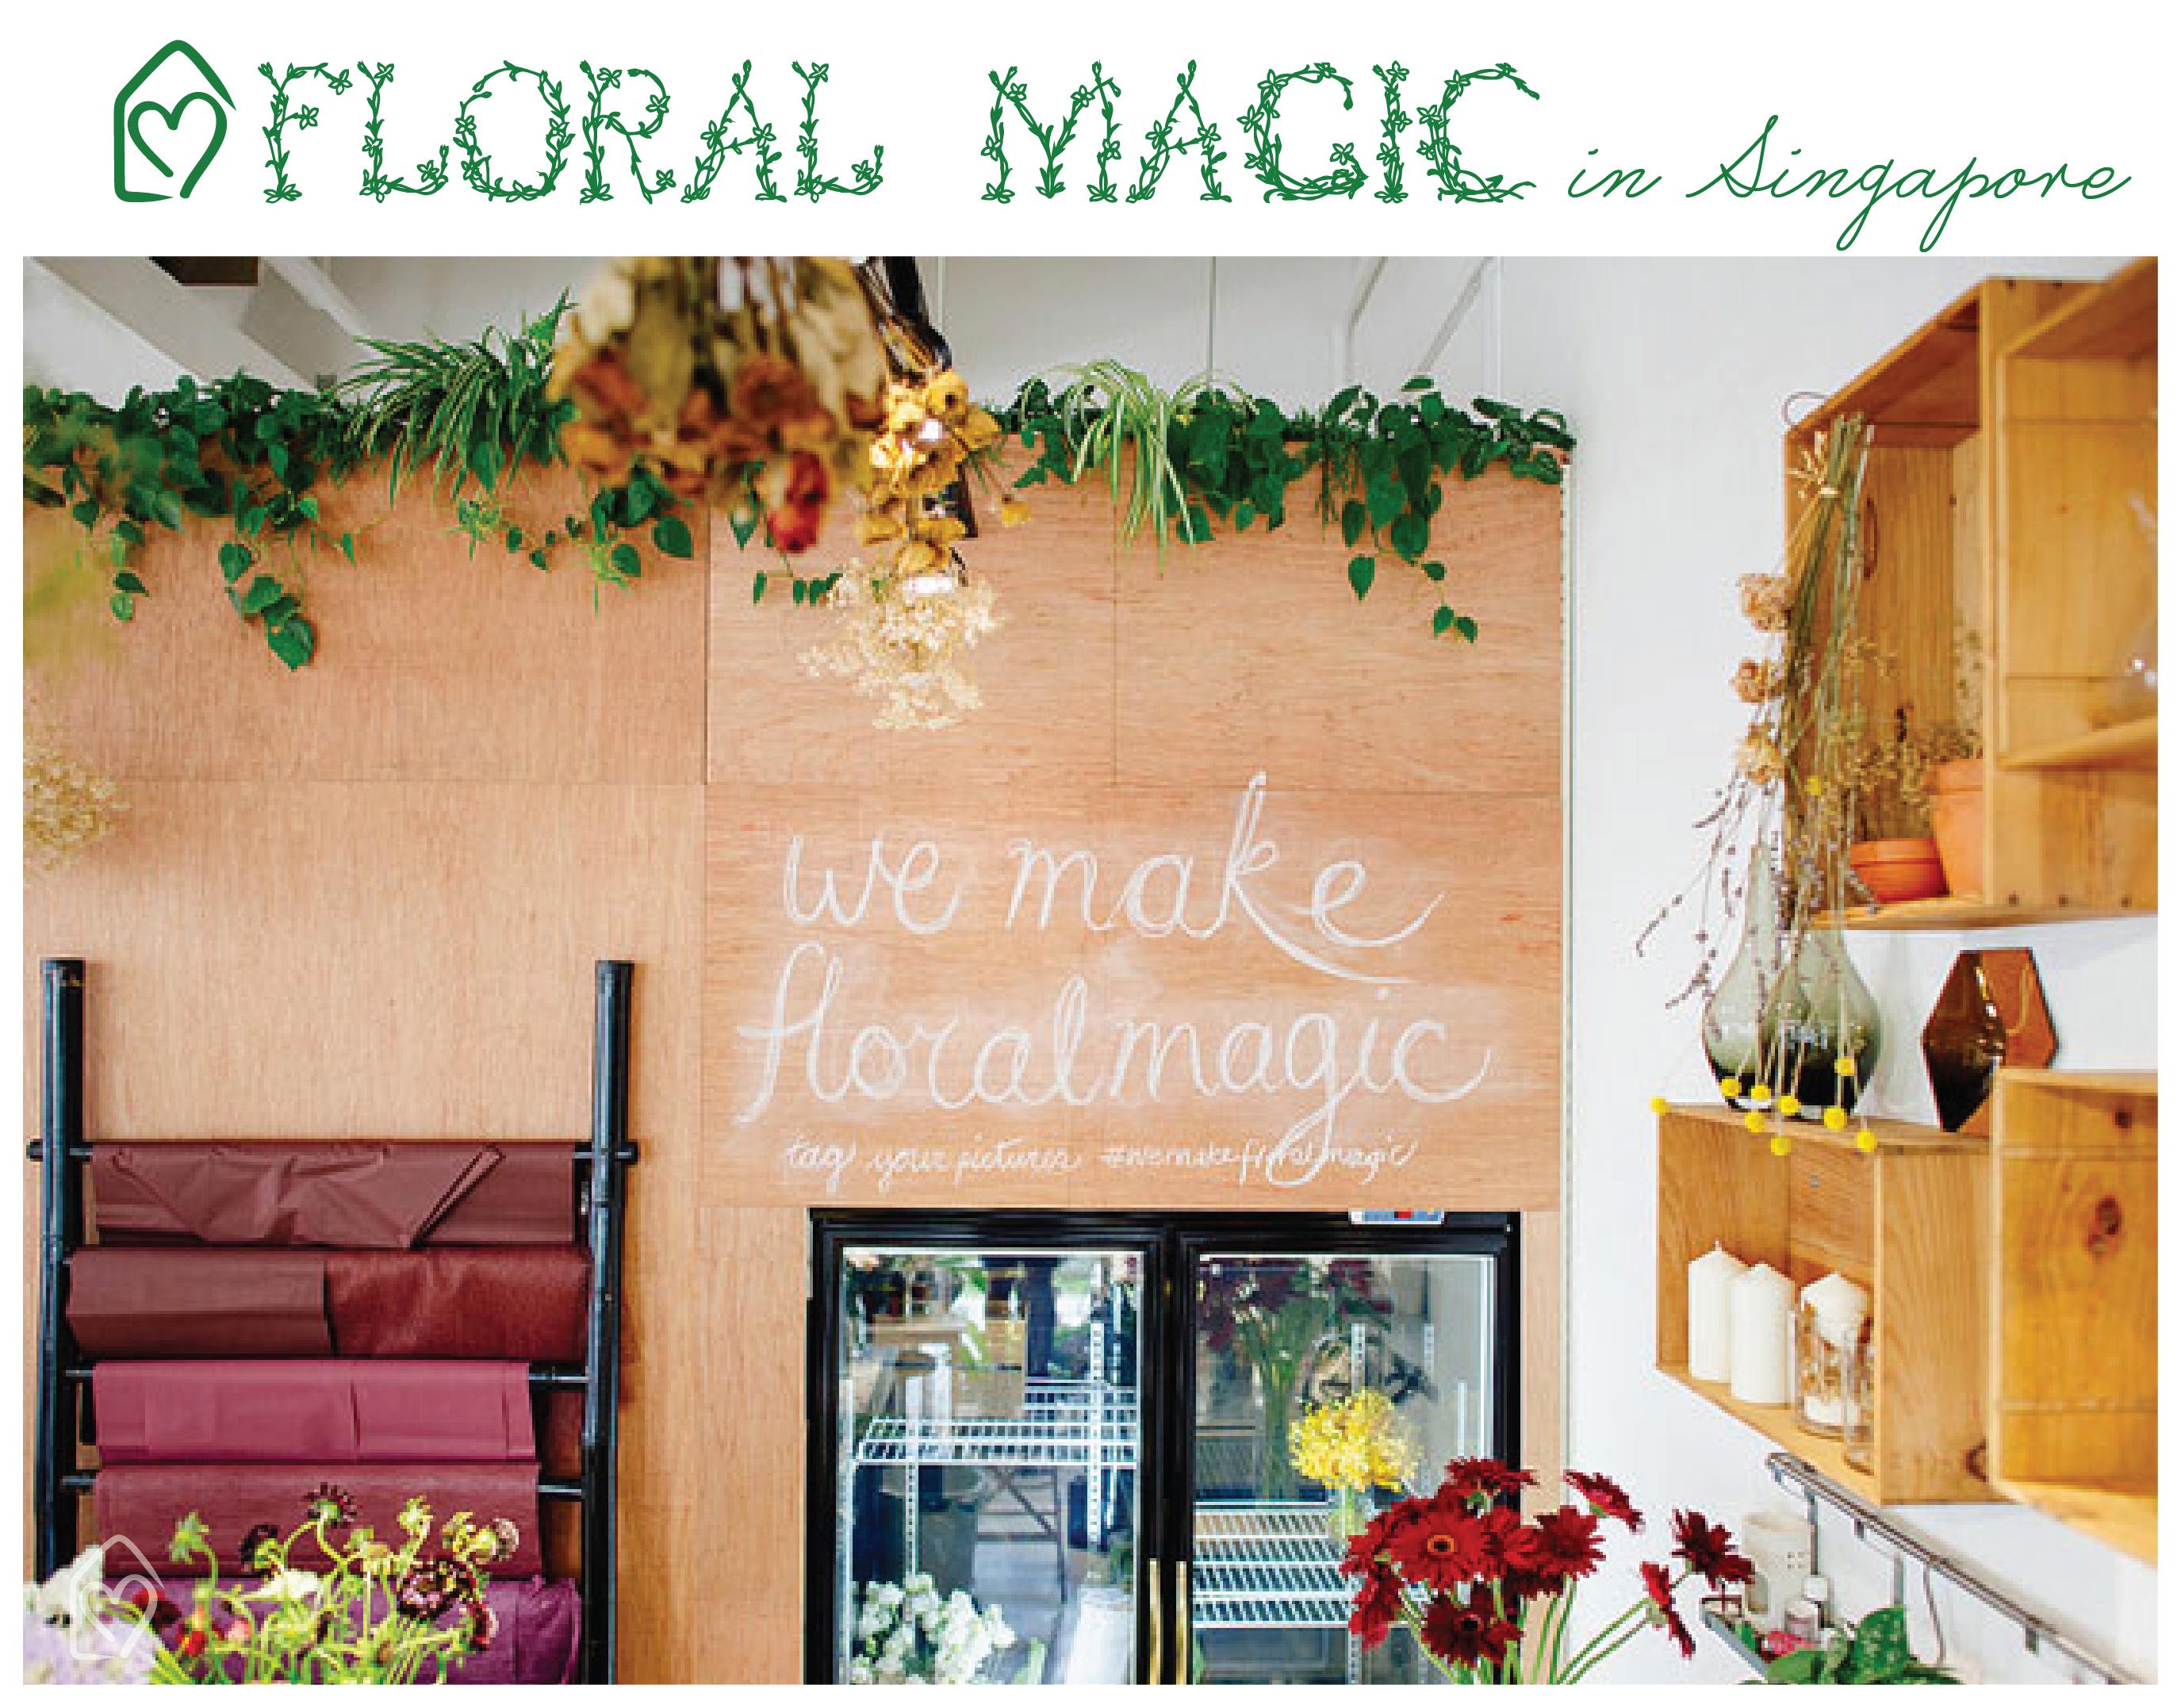 floralmagic-01